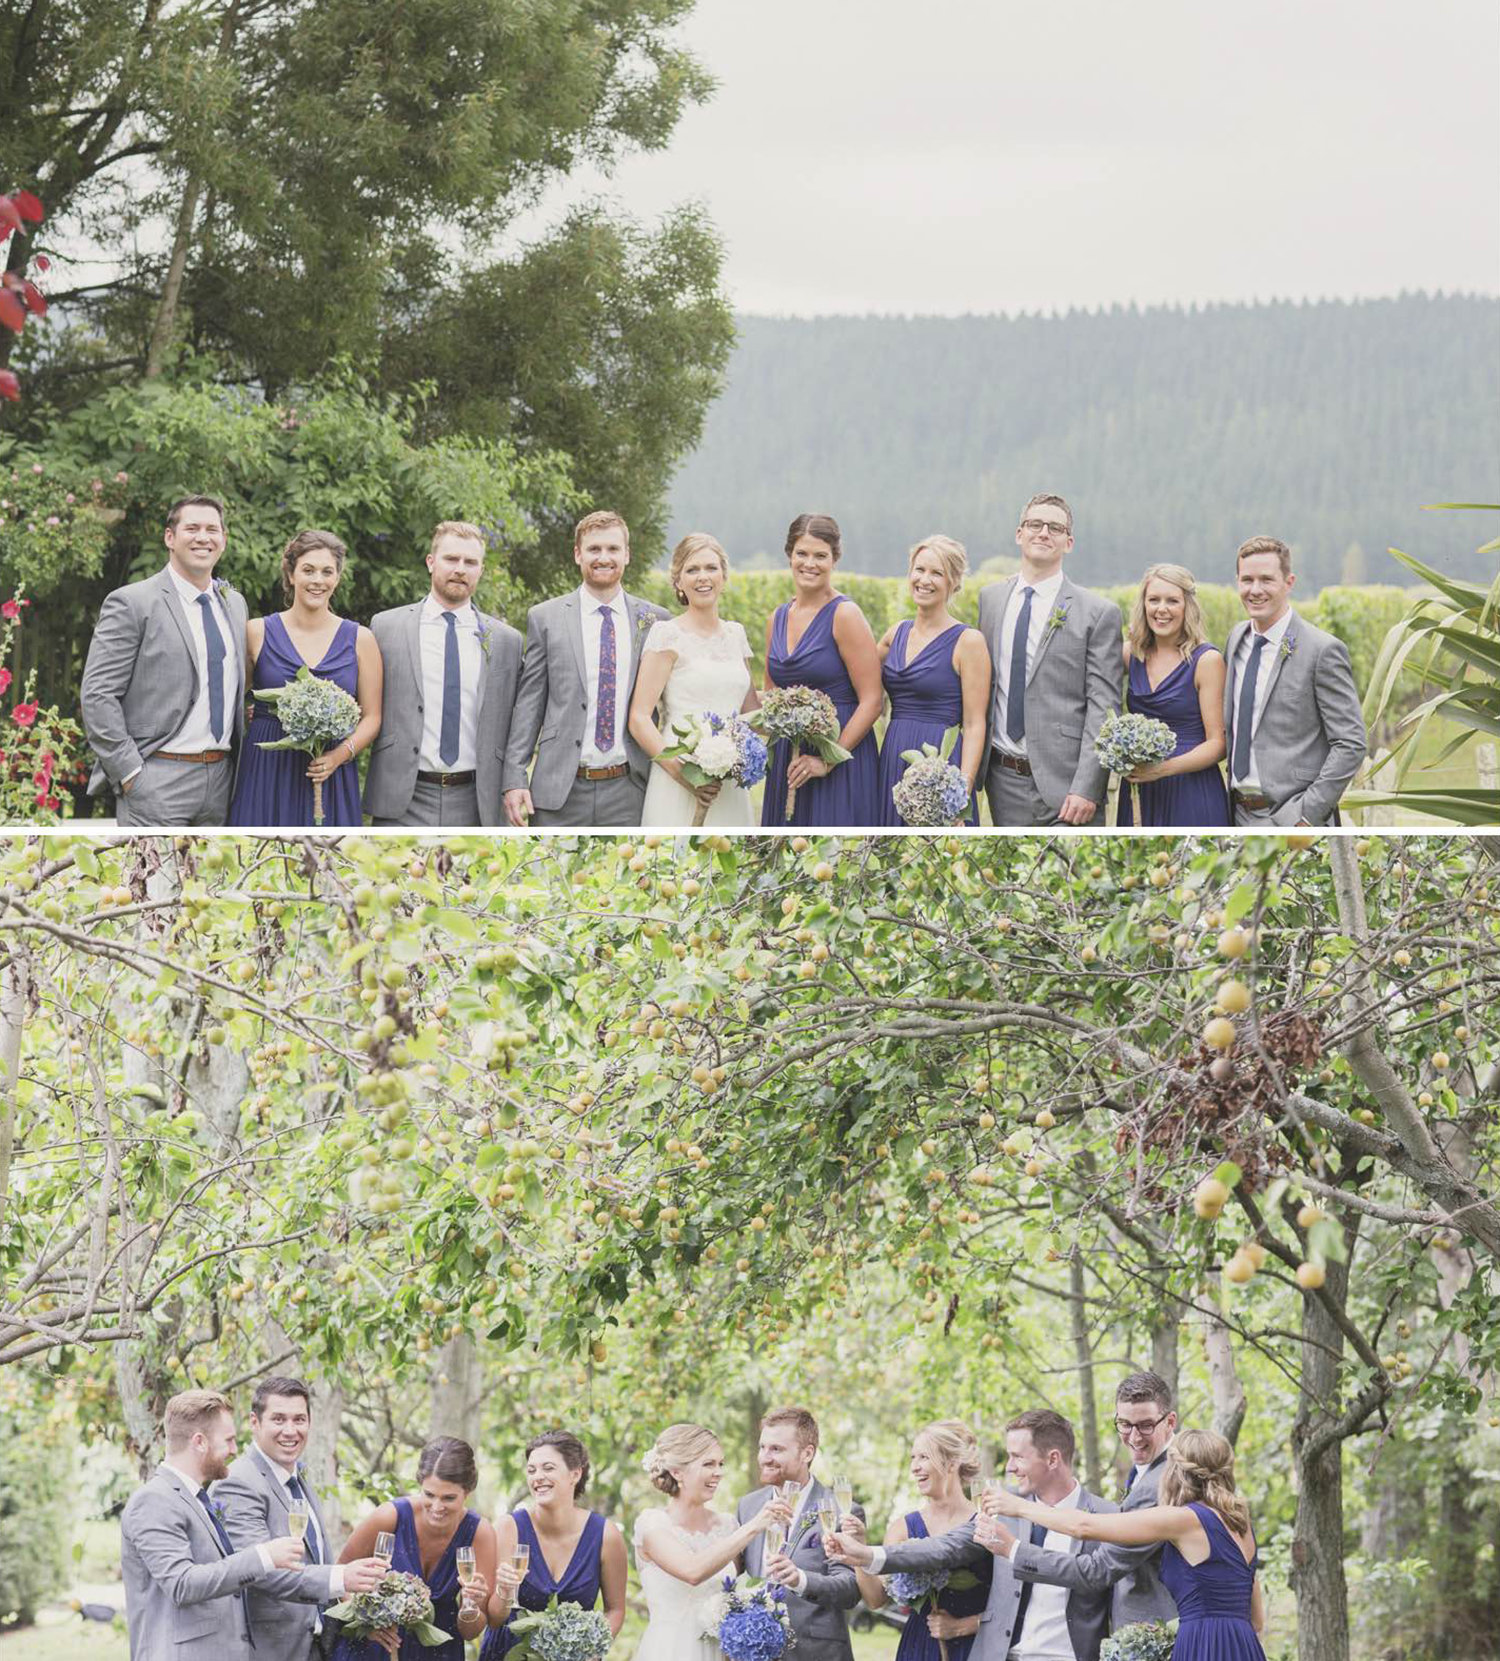 Hawkes-Bay-wedding-siaosi-photography09.JPG